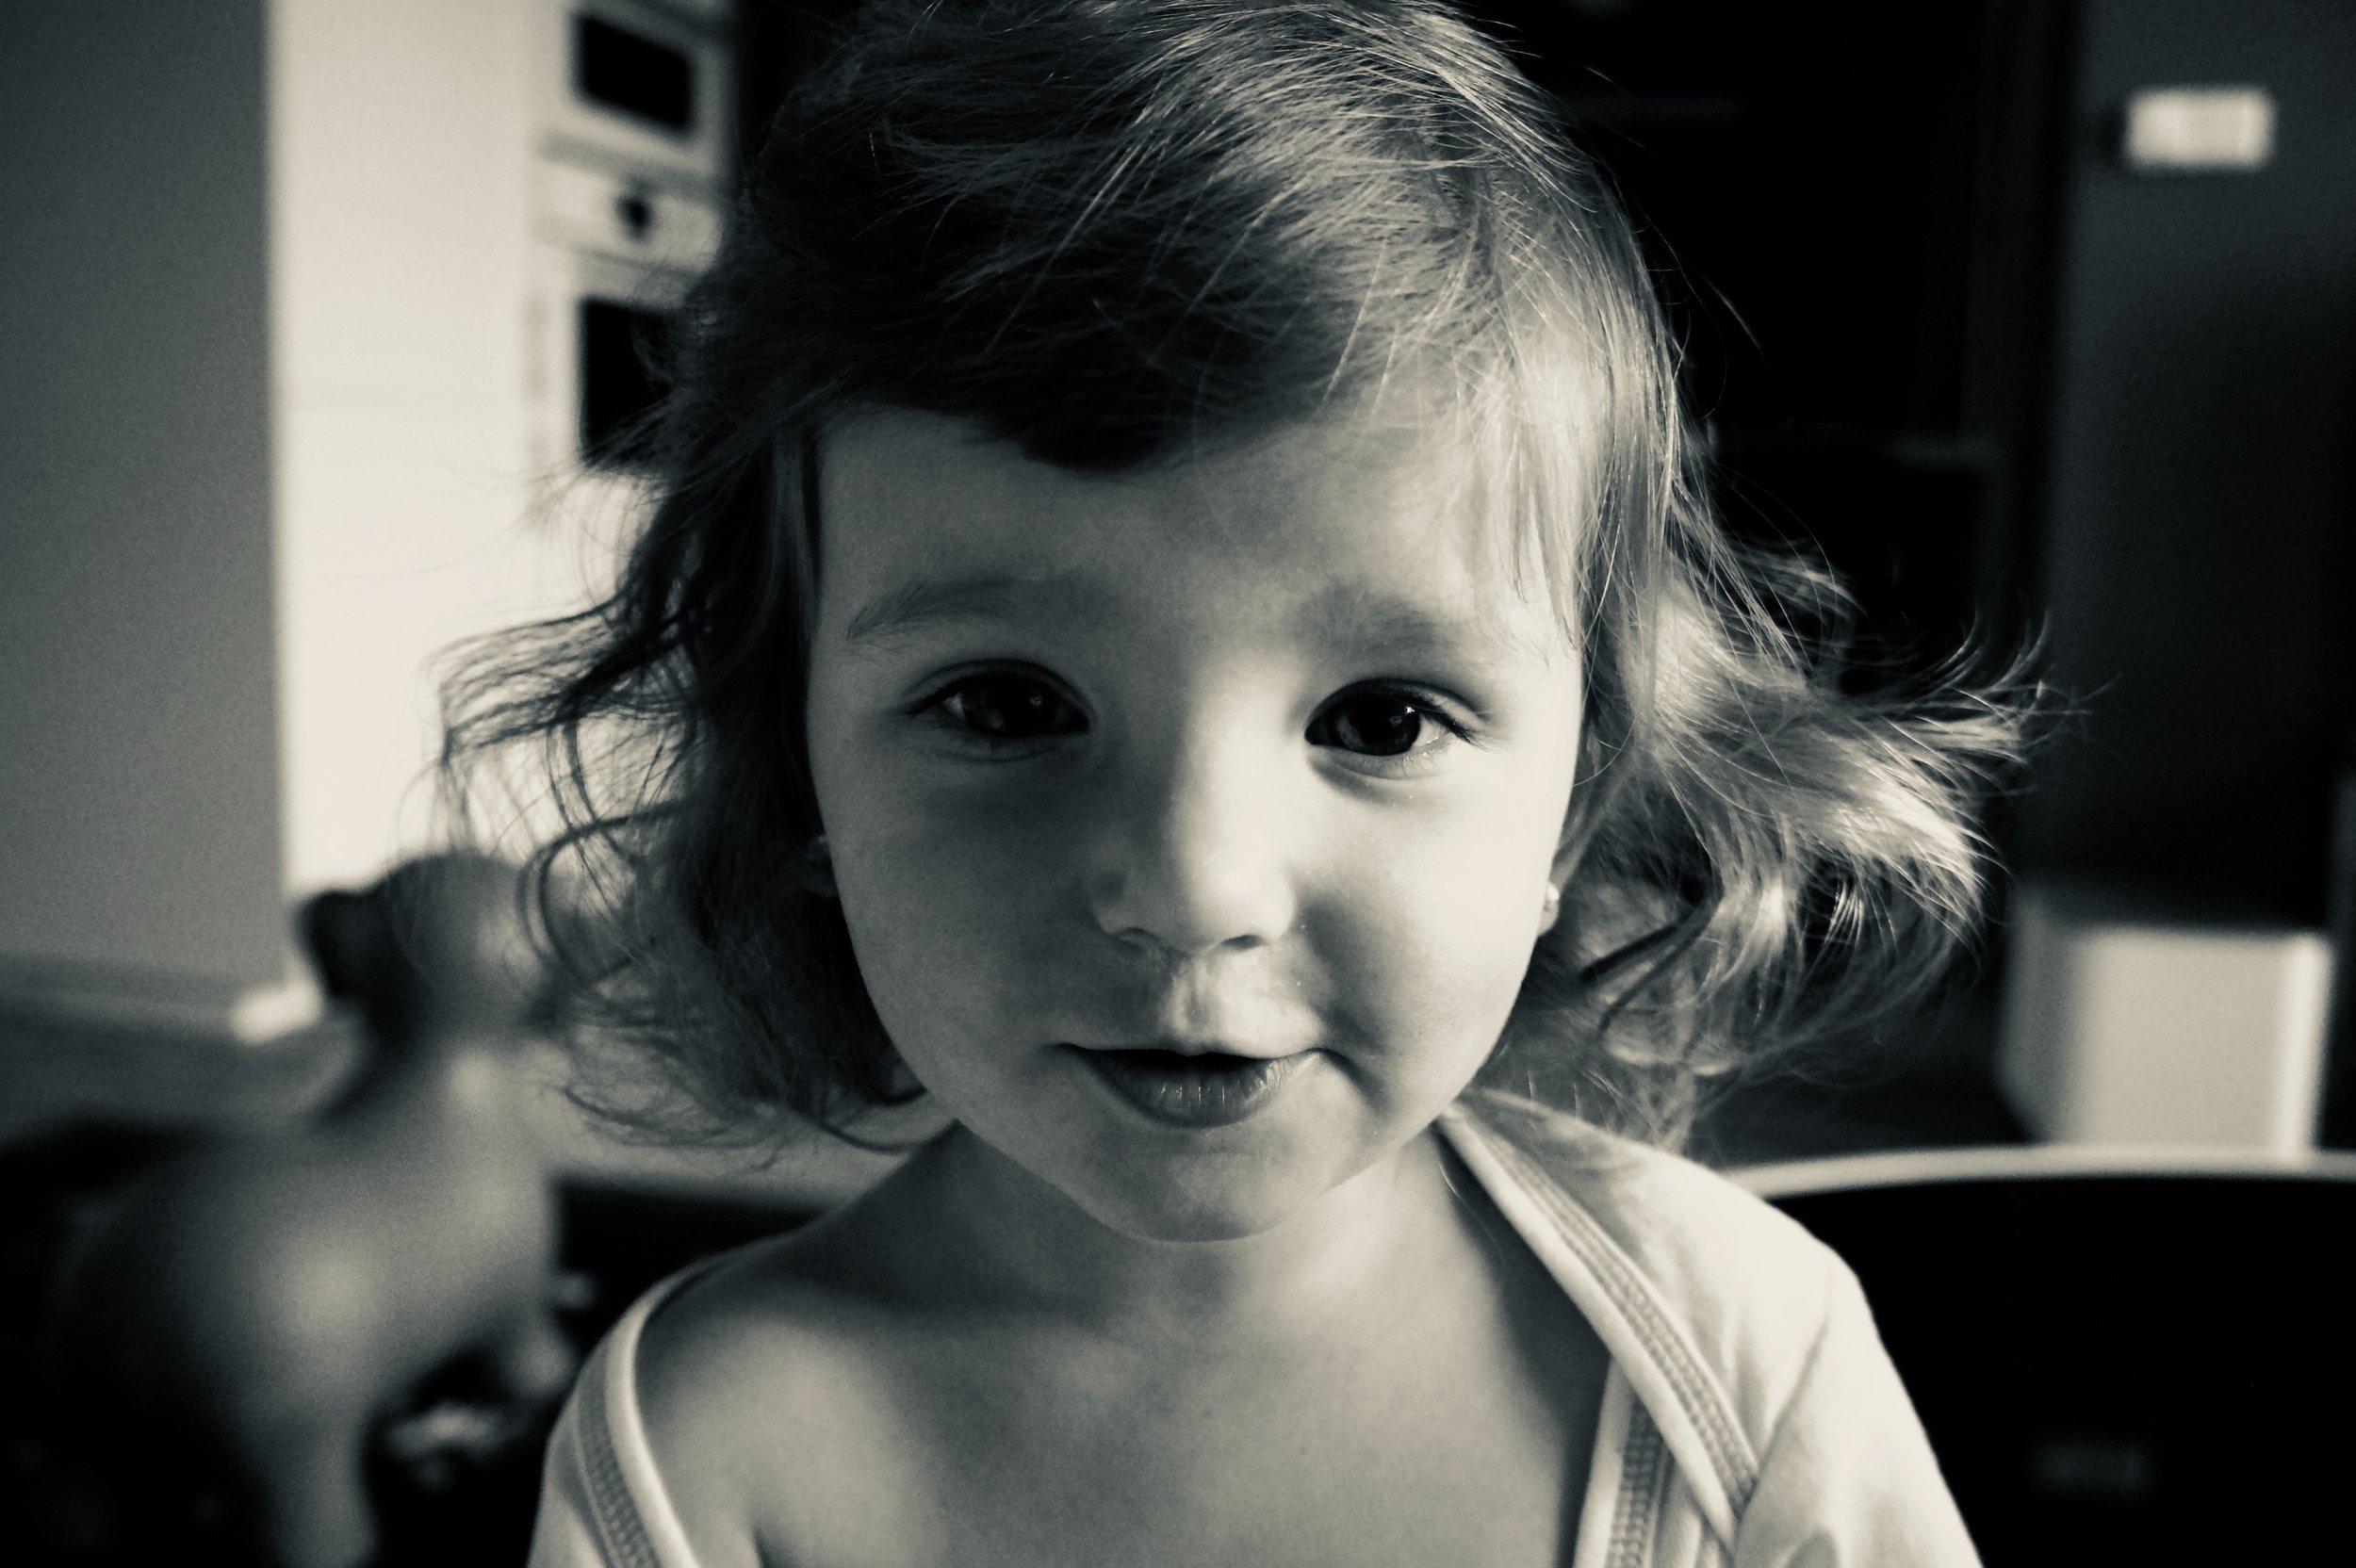 adorable-baby-beautiful-670244.jpg